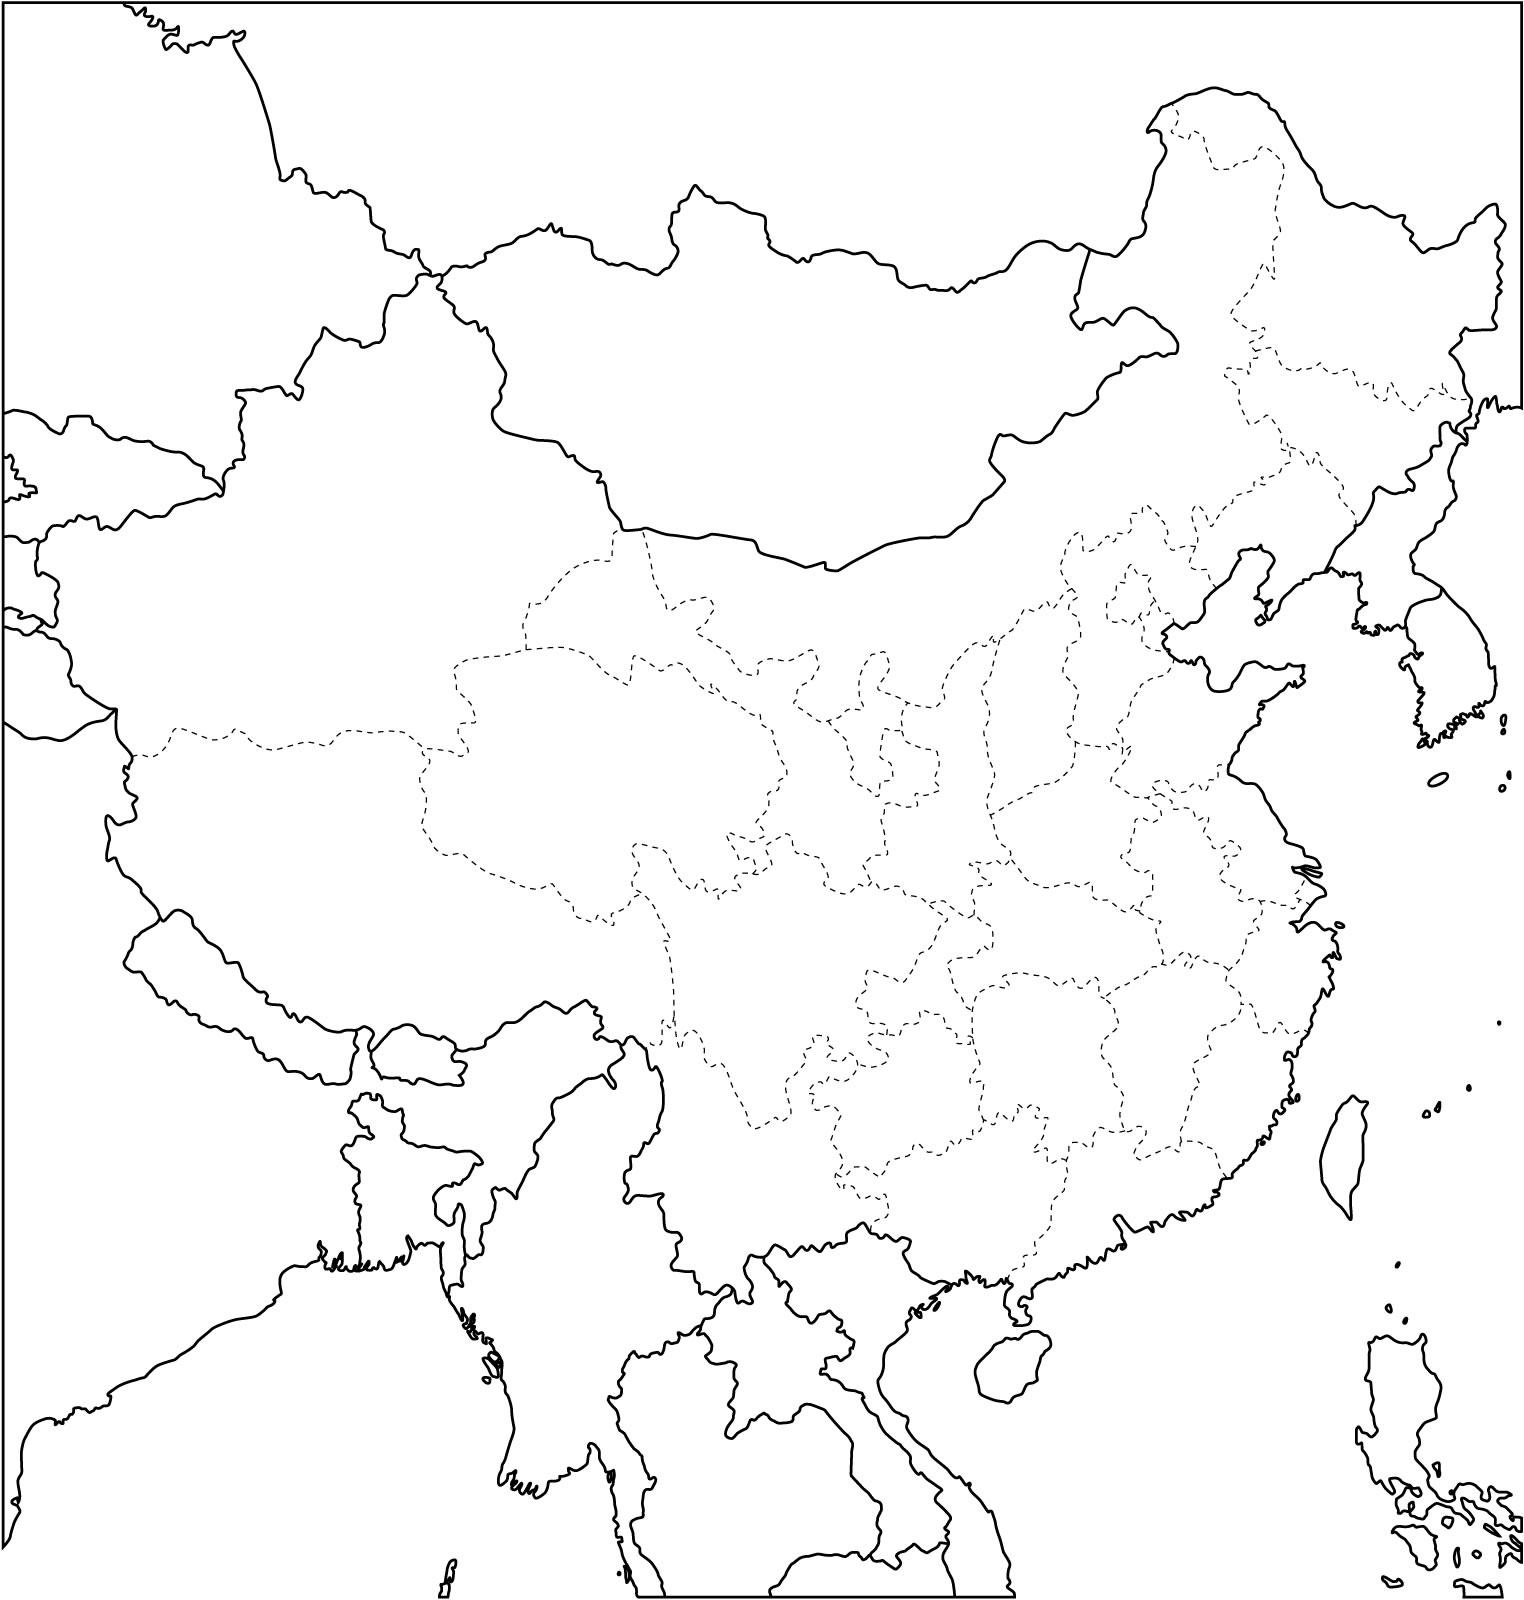 Carte Muette Asie Oceanie.Carte Chine Vierge Carte Vierge De La Chine